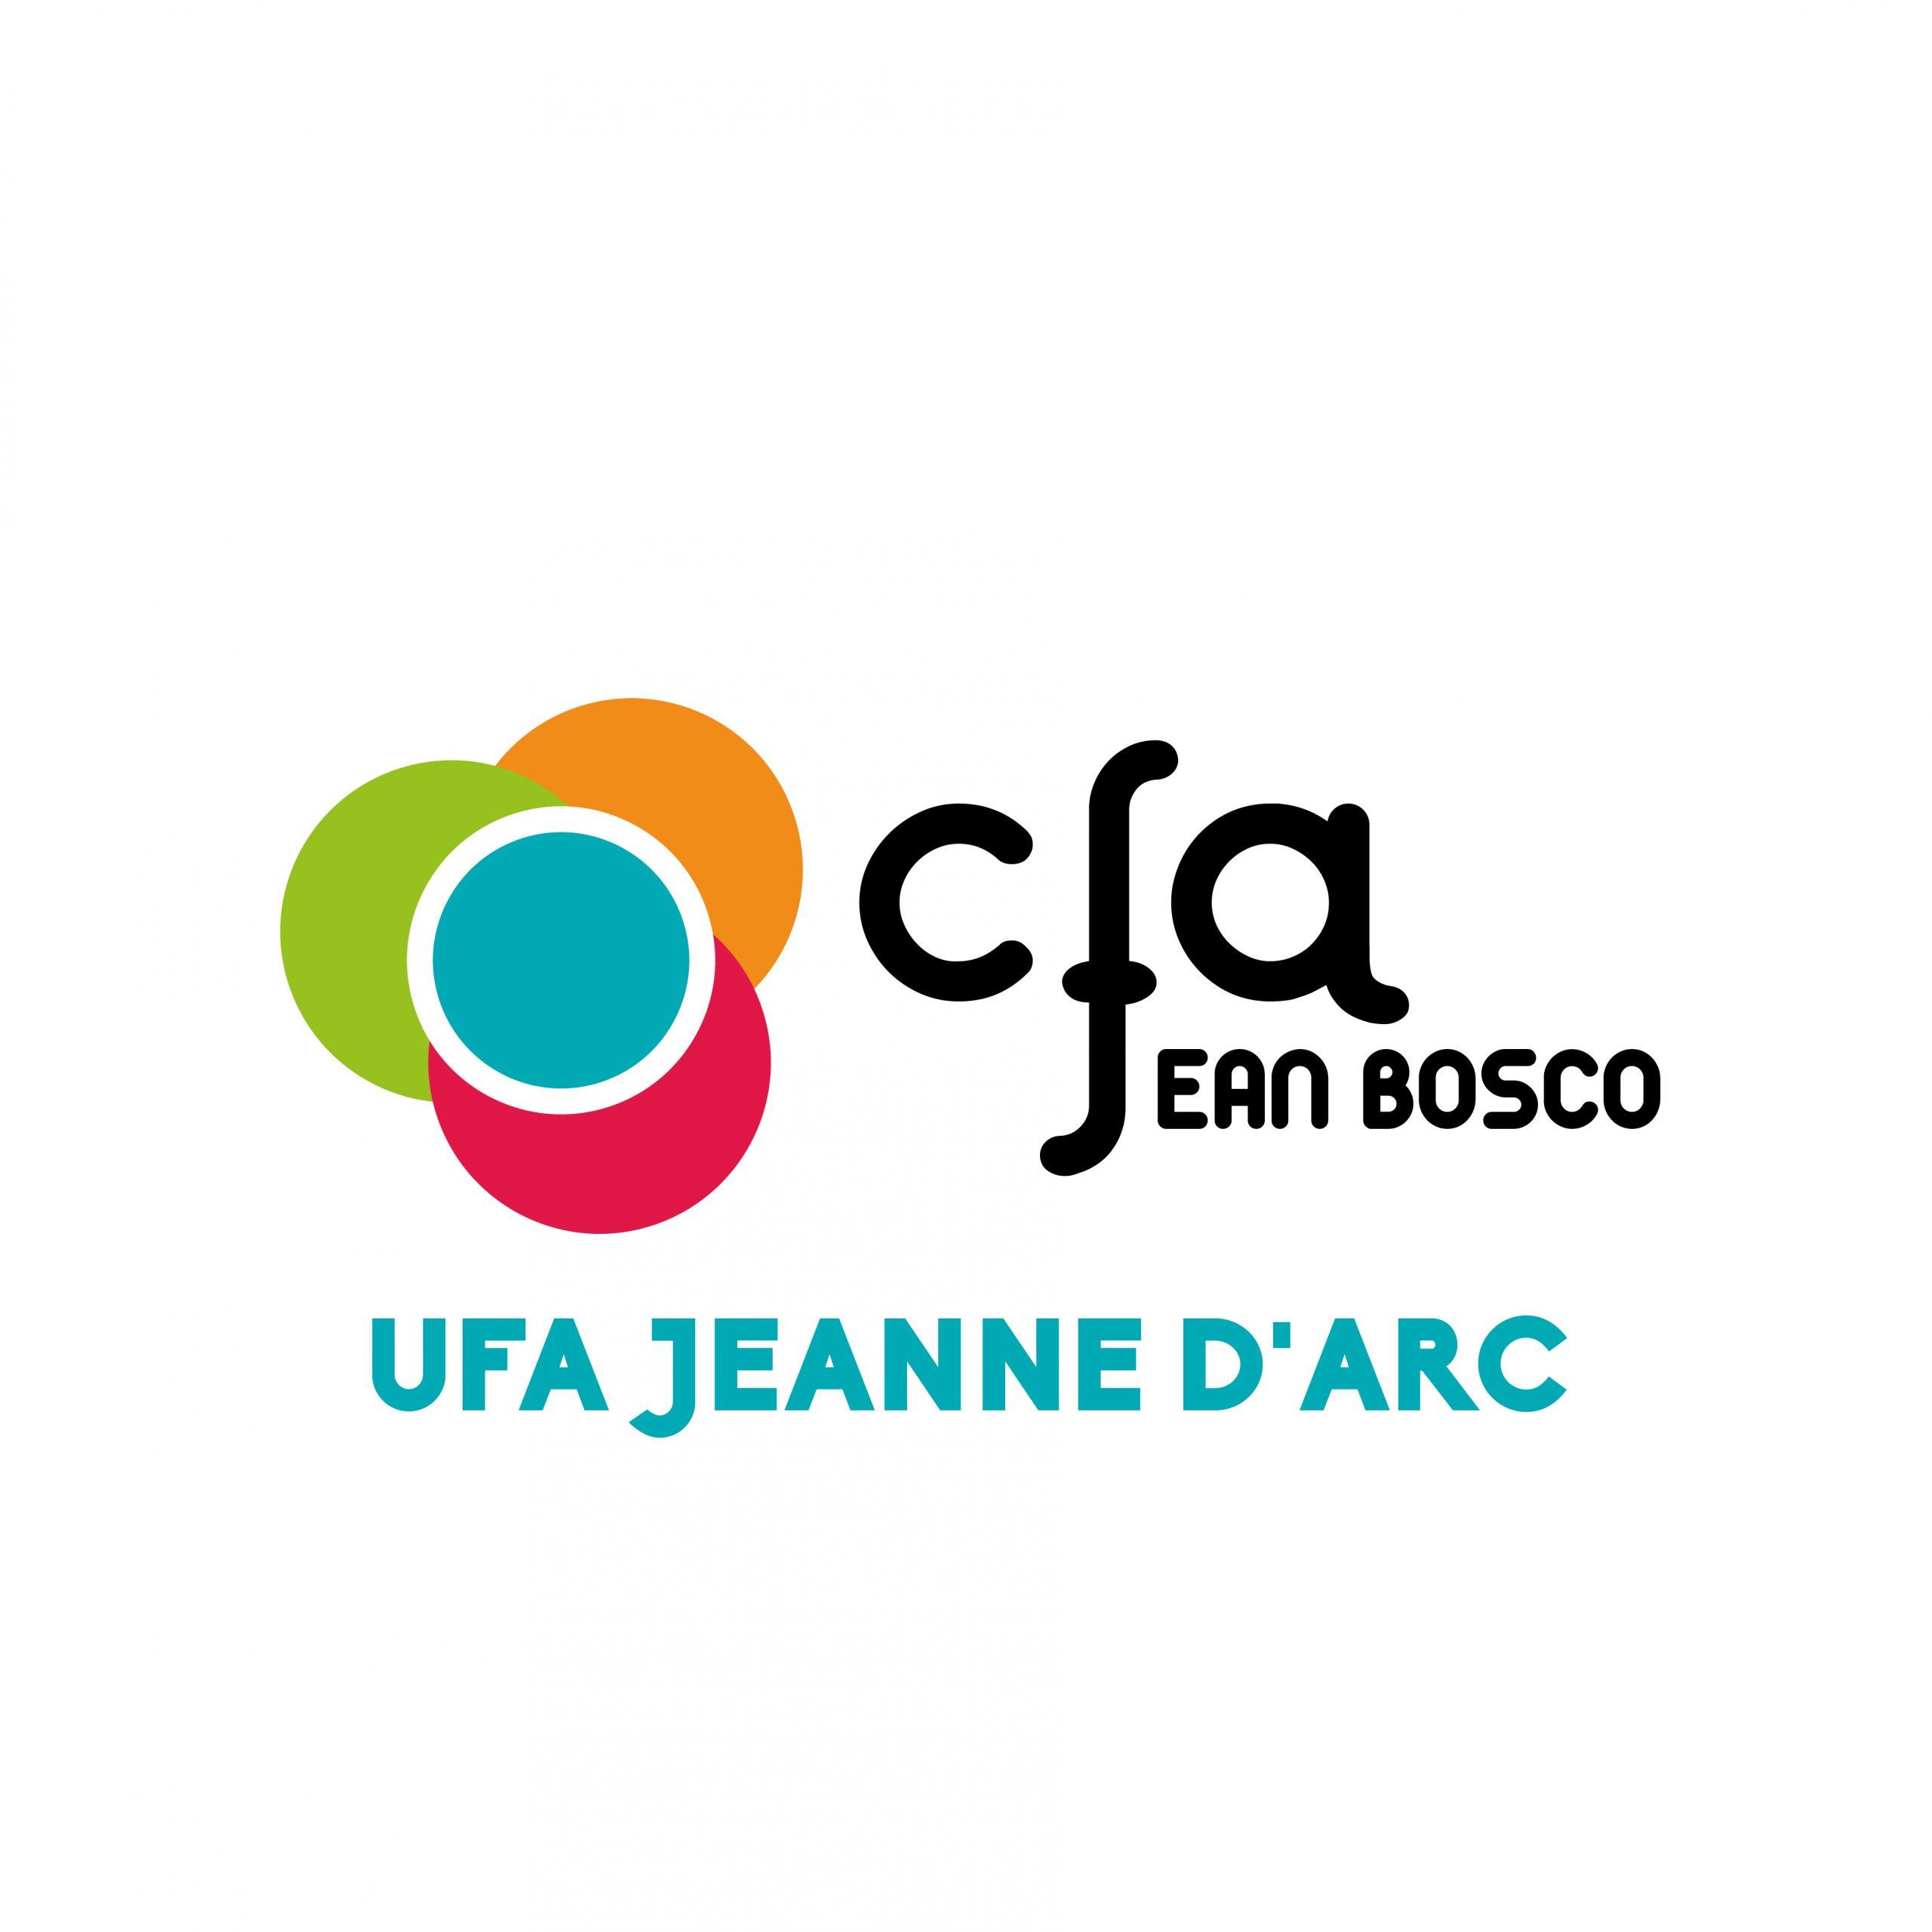 UFA JEANNE D'ARC